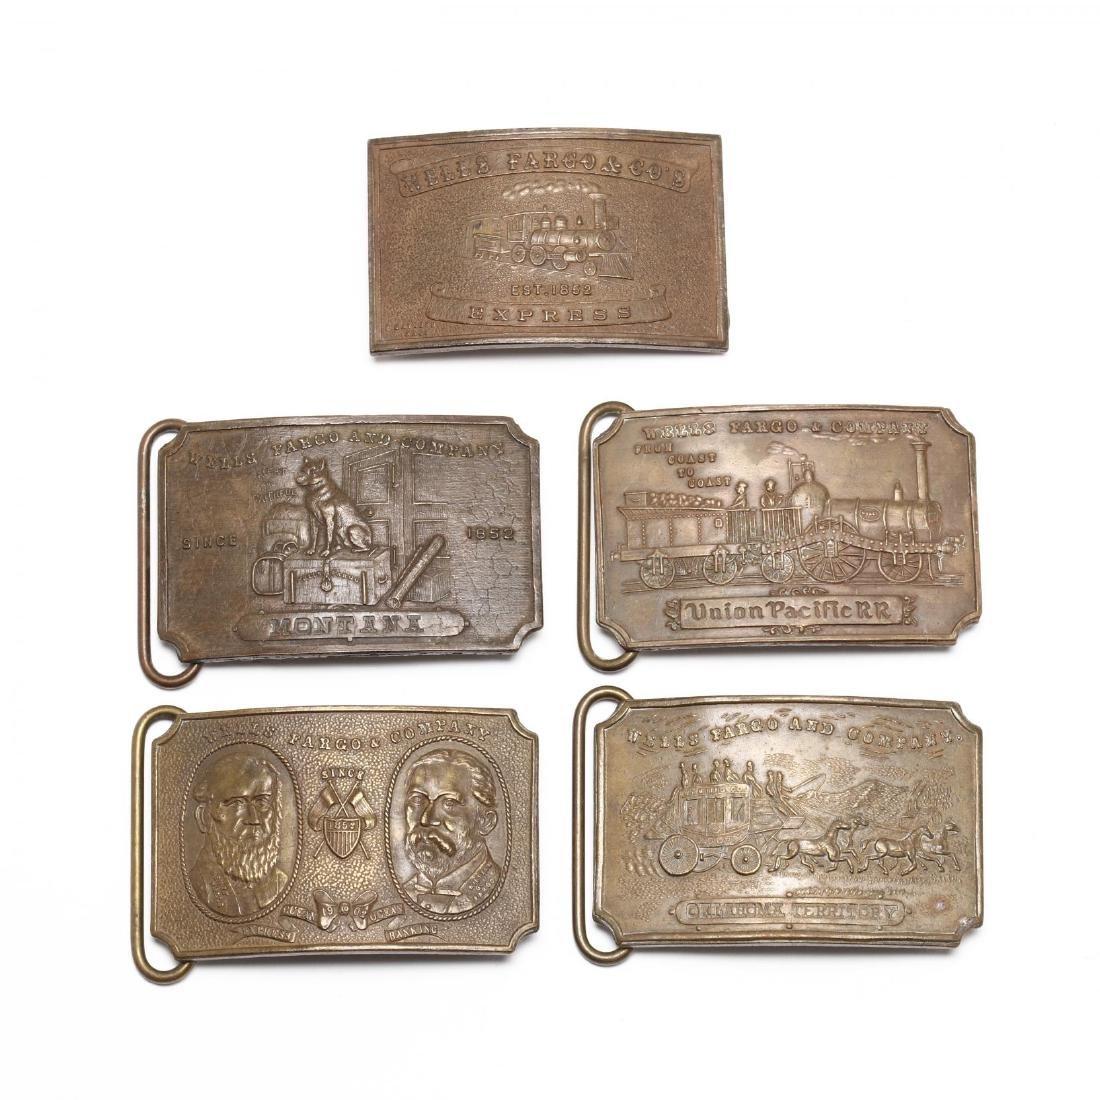 Five Vintage Tiffany Belt Buckles for Wells Fargo &